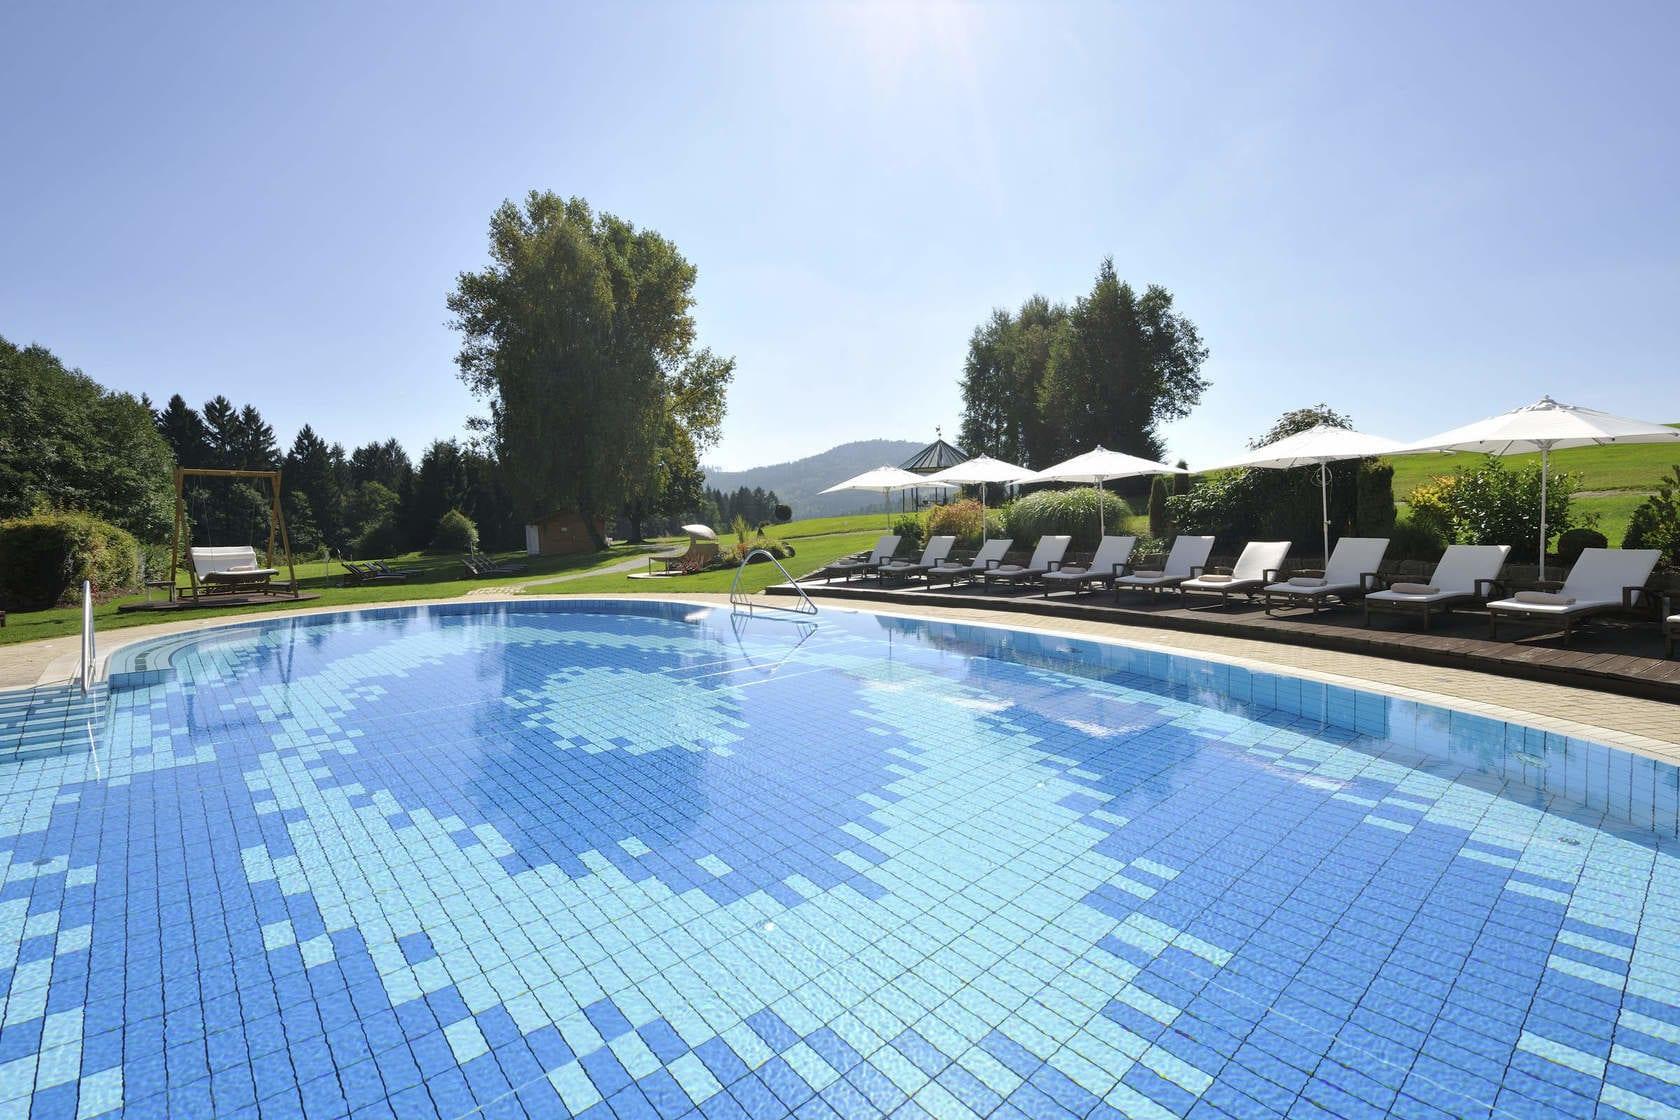 Außenpool Wellnesshotel Bodenmais Wellnessurlaub Swimmingpool Hotel ...